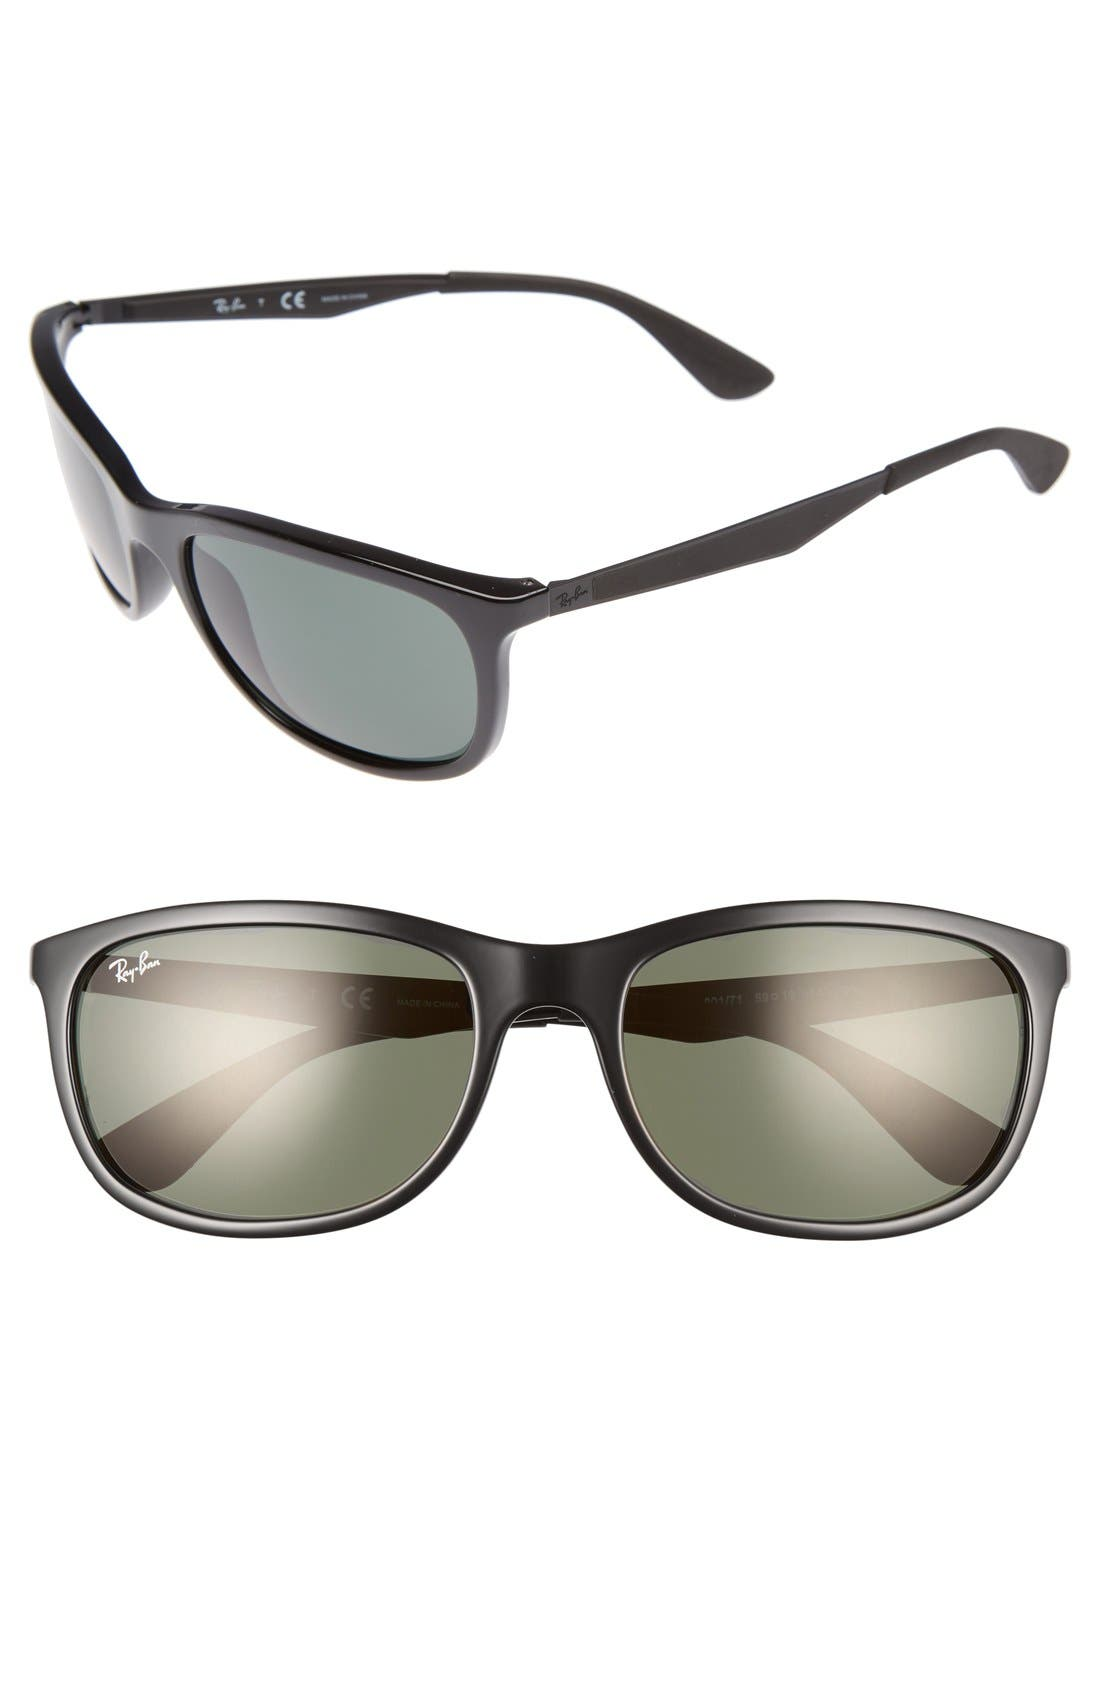 Ray-Ban Active Lifestyle 59mm Rectangular Sunglasses